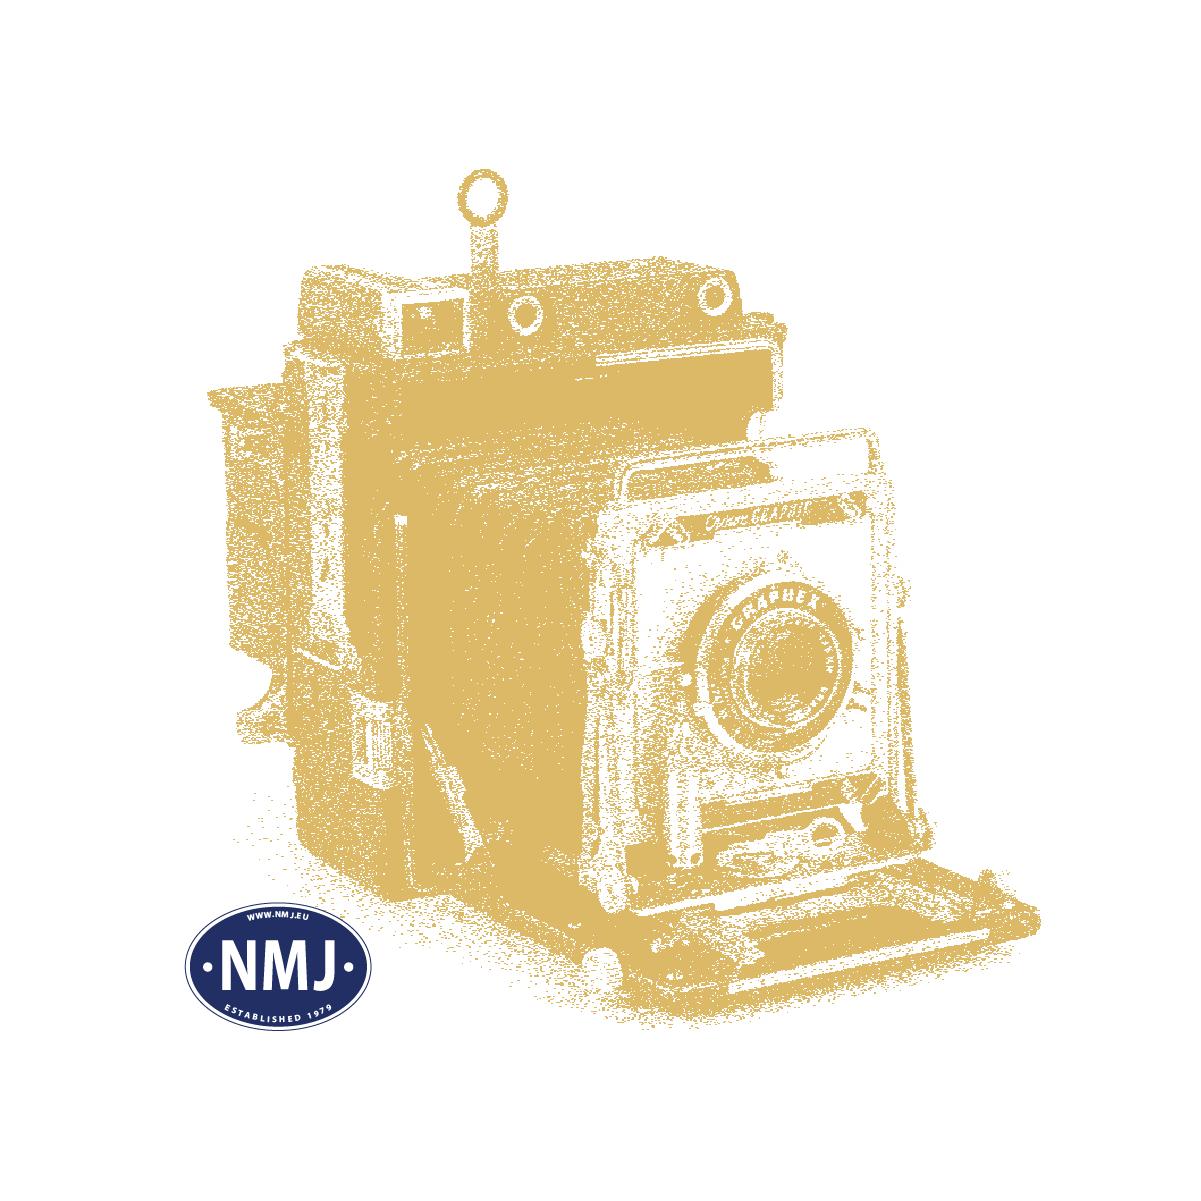 NMJSCOT4.3 - NMJ Superline Modell des Co type 4 der NSB Messing Ausführung